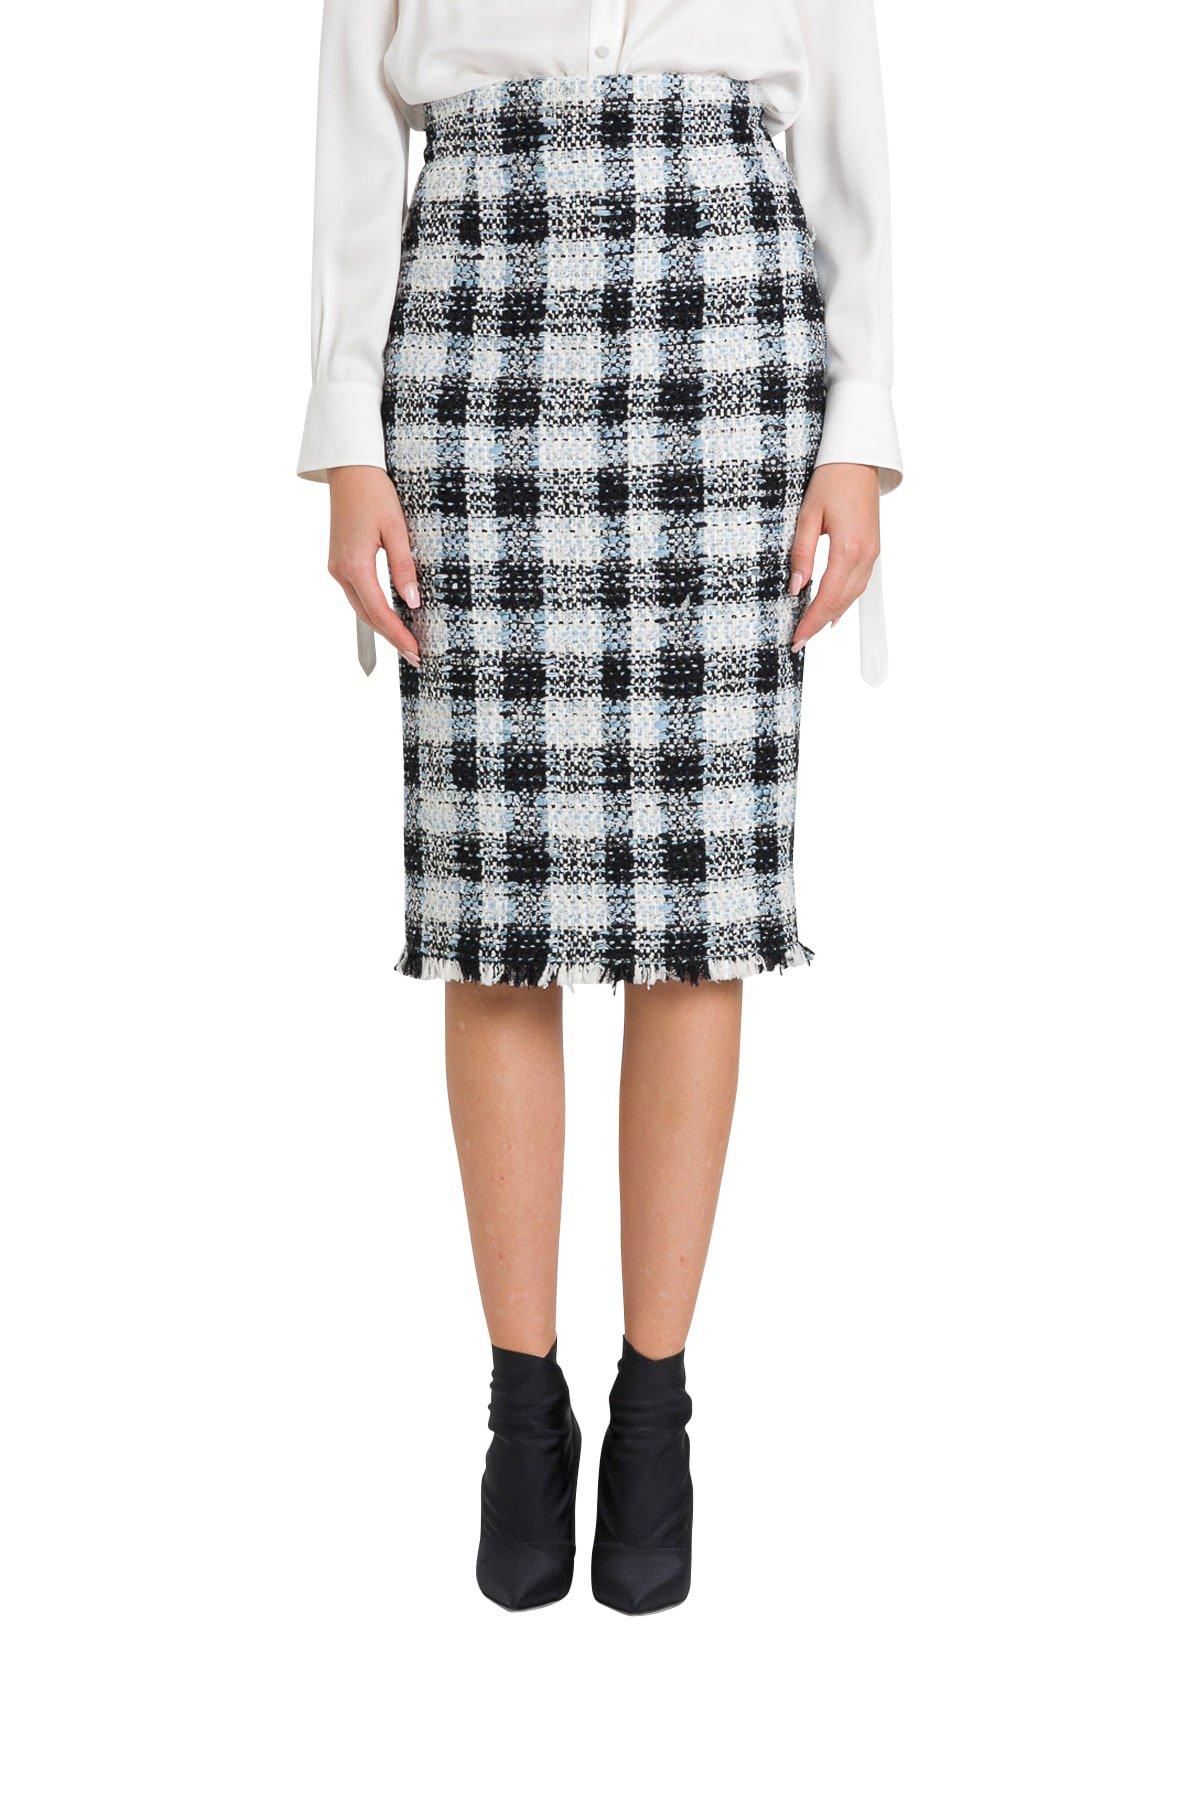 Alexander McQueen Tweed Midi Skirt With Check Motif